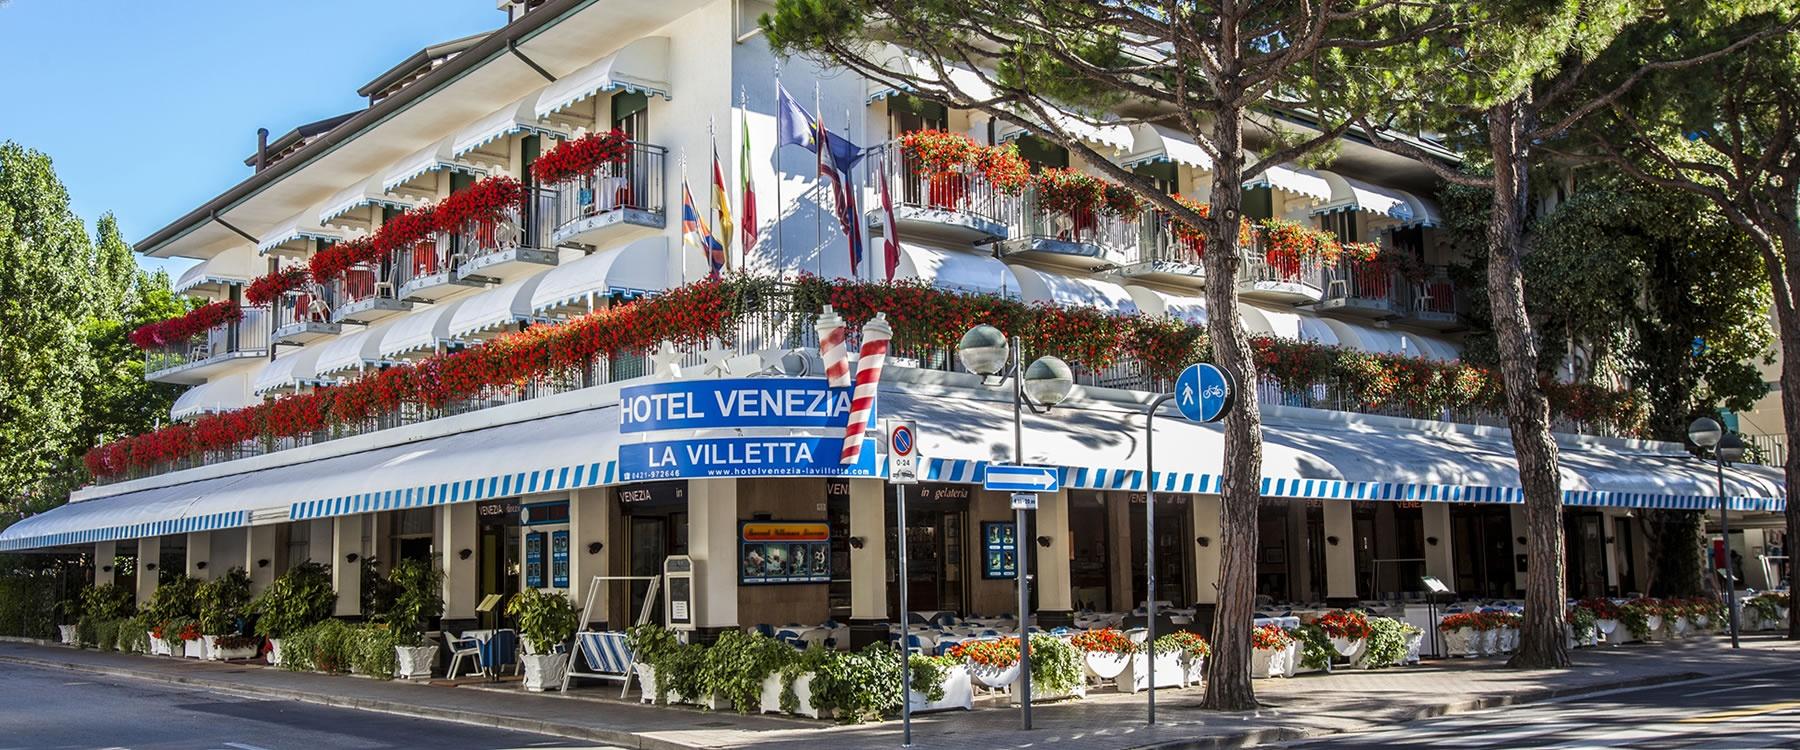 Venezia Hotel  Stelle